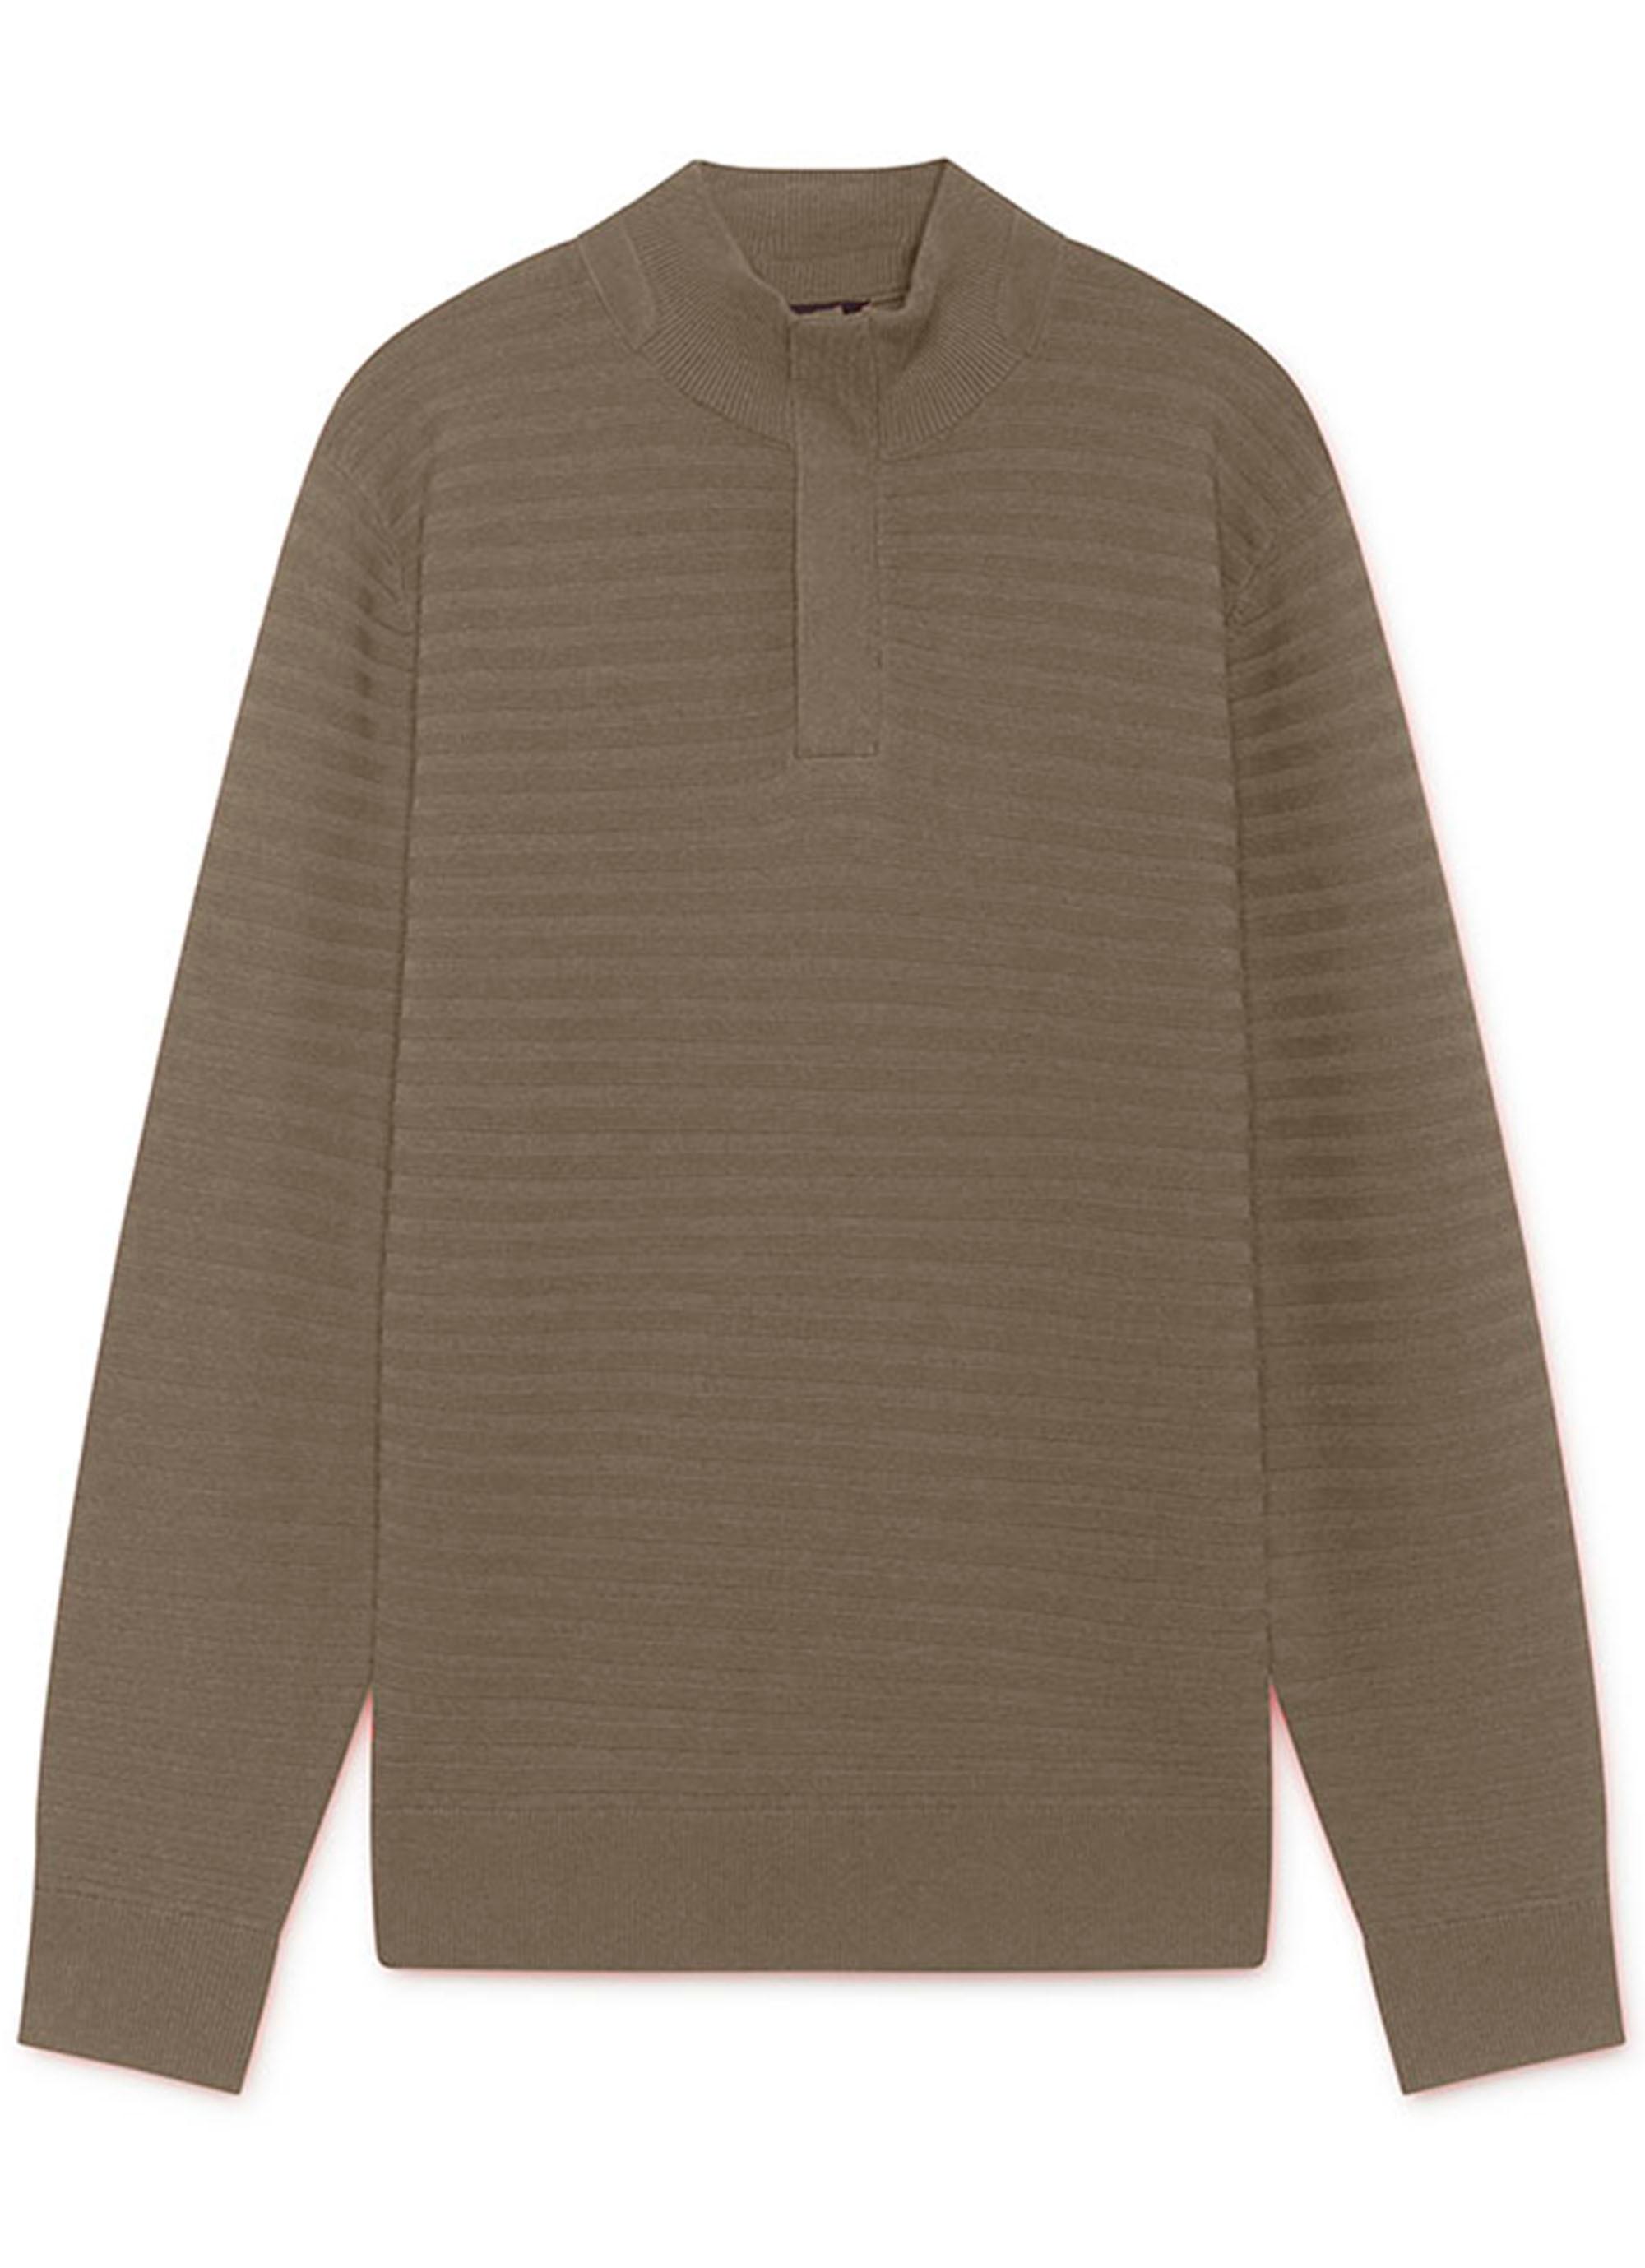 1904cc5ba Men s Designer Knitwear and Jumpers - Harvey Nichols